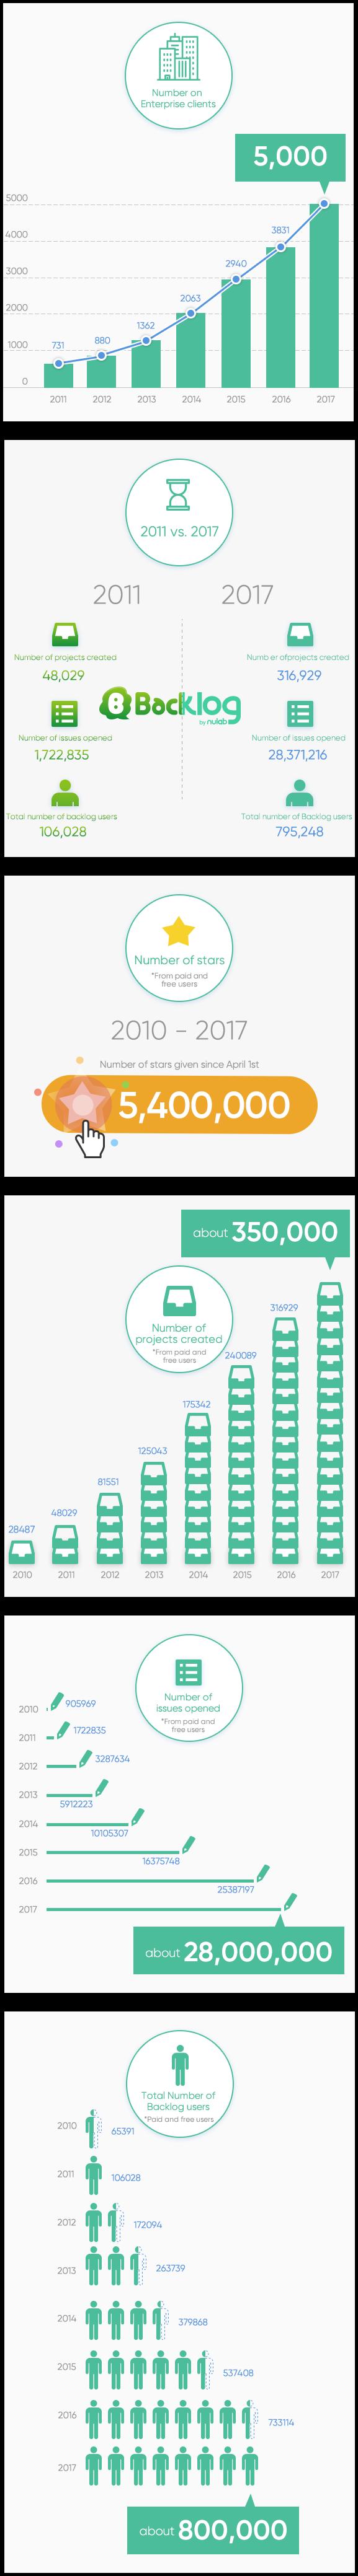 Backlog5000 Infographic